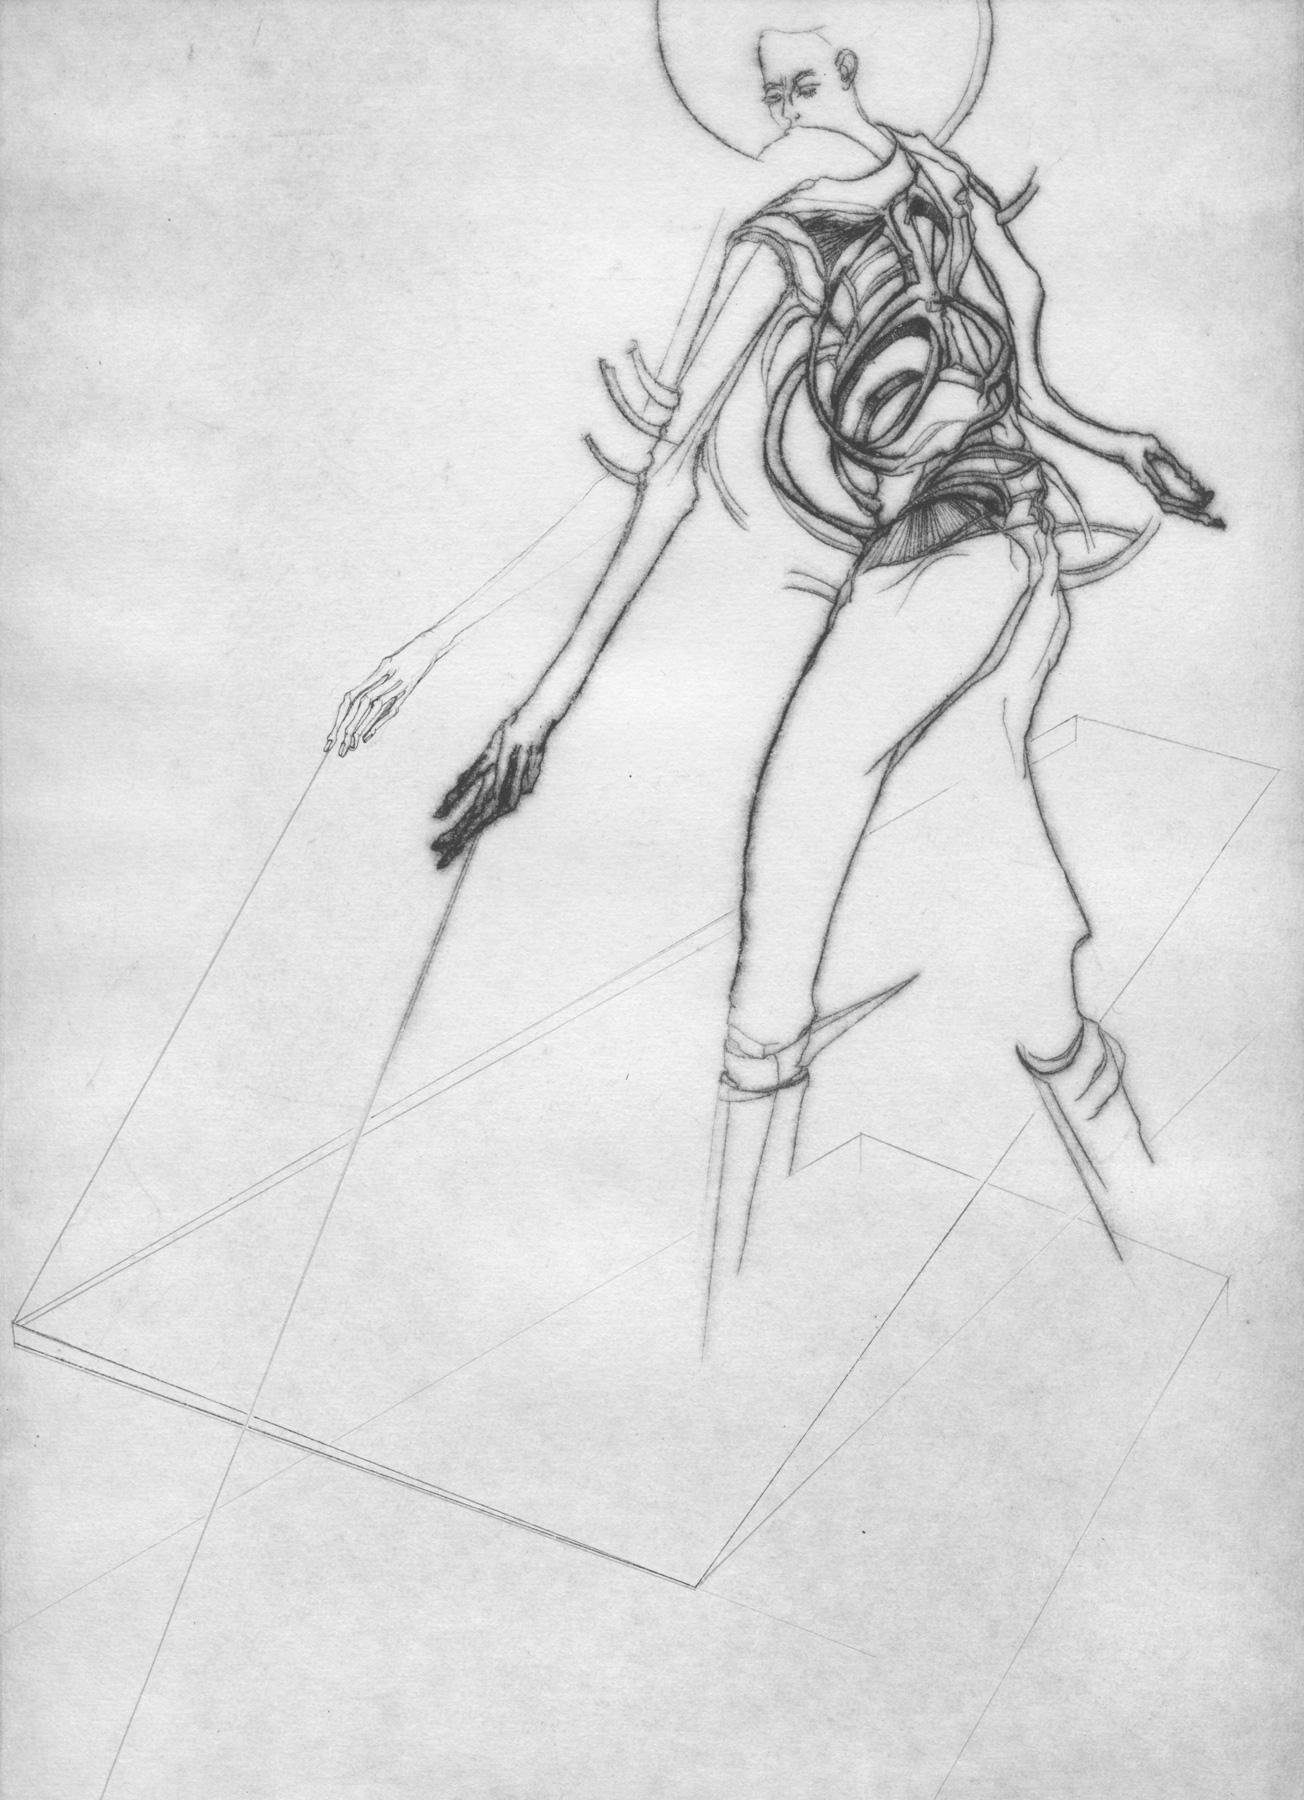 Nina Annabelle Märkl | One step inside 7|14 | Kaltnadel, Tusche, Bleistift, 300g Hahnemühle Büttenpapier | Platte 35 x 23 cm Papier 56 x 39 cm